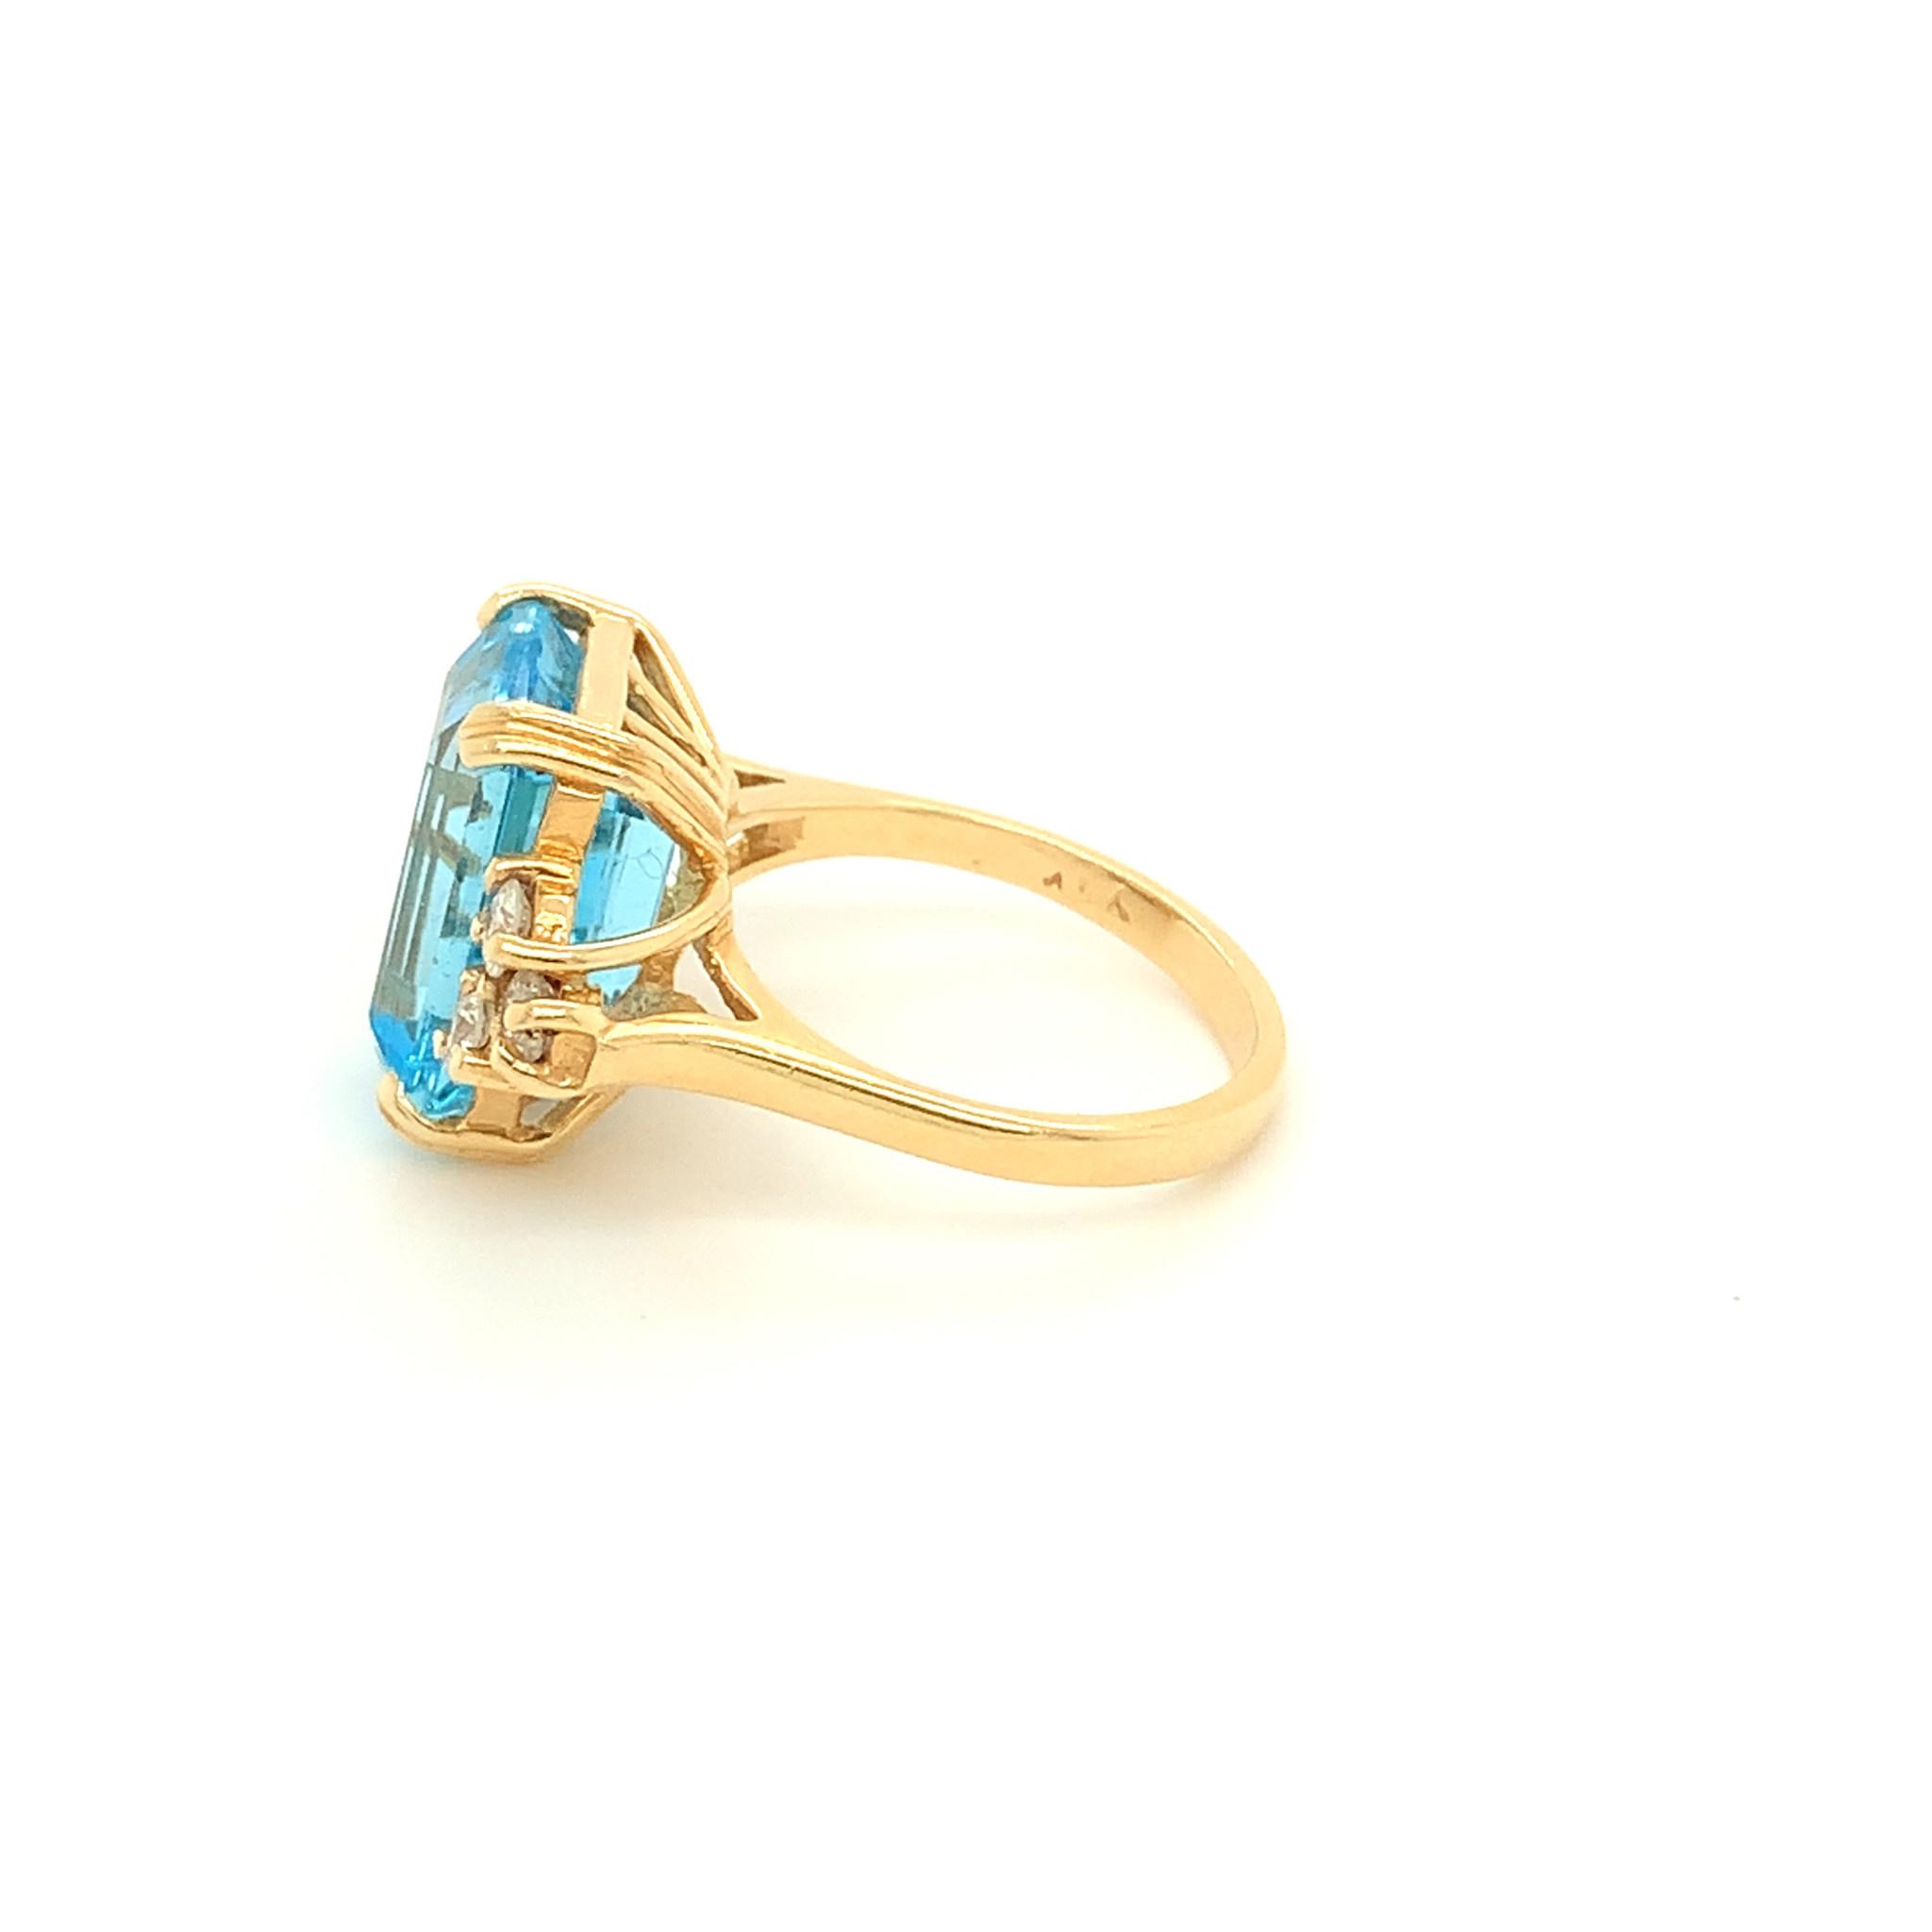 Freedman 9 Carat Blue Topaz & Diamond Ring